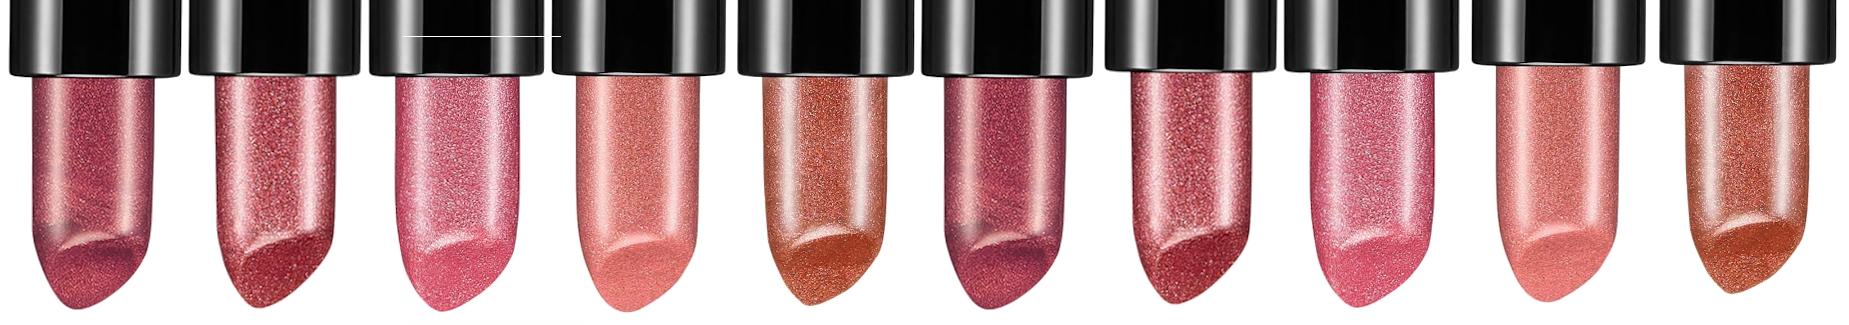 Illamasqua lipsticks